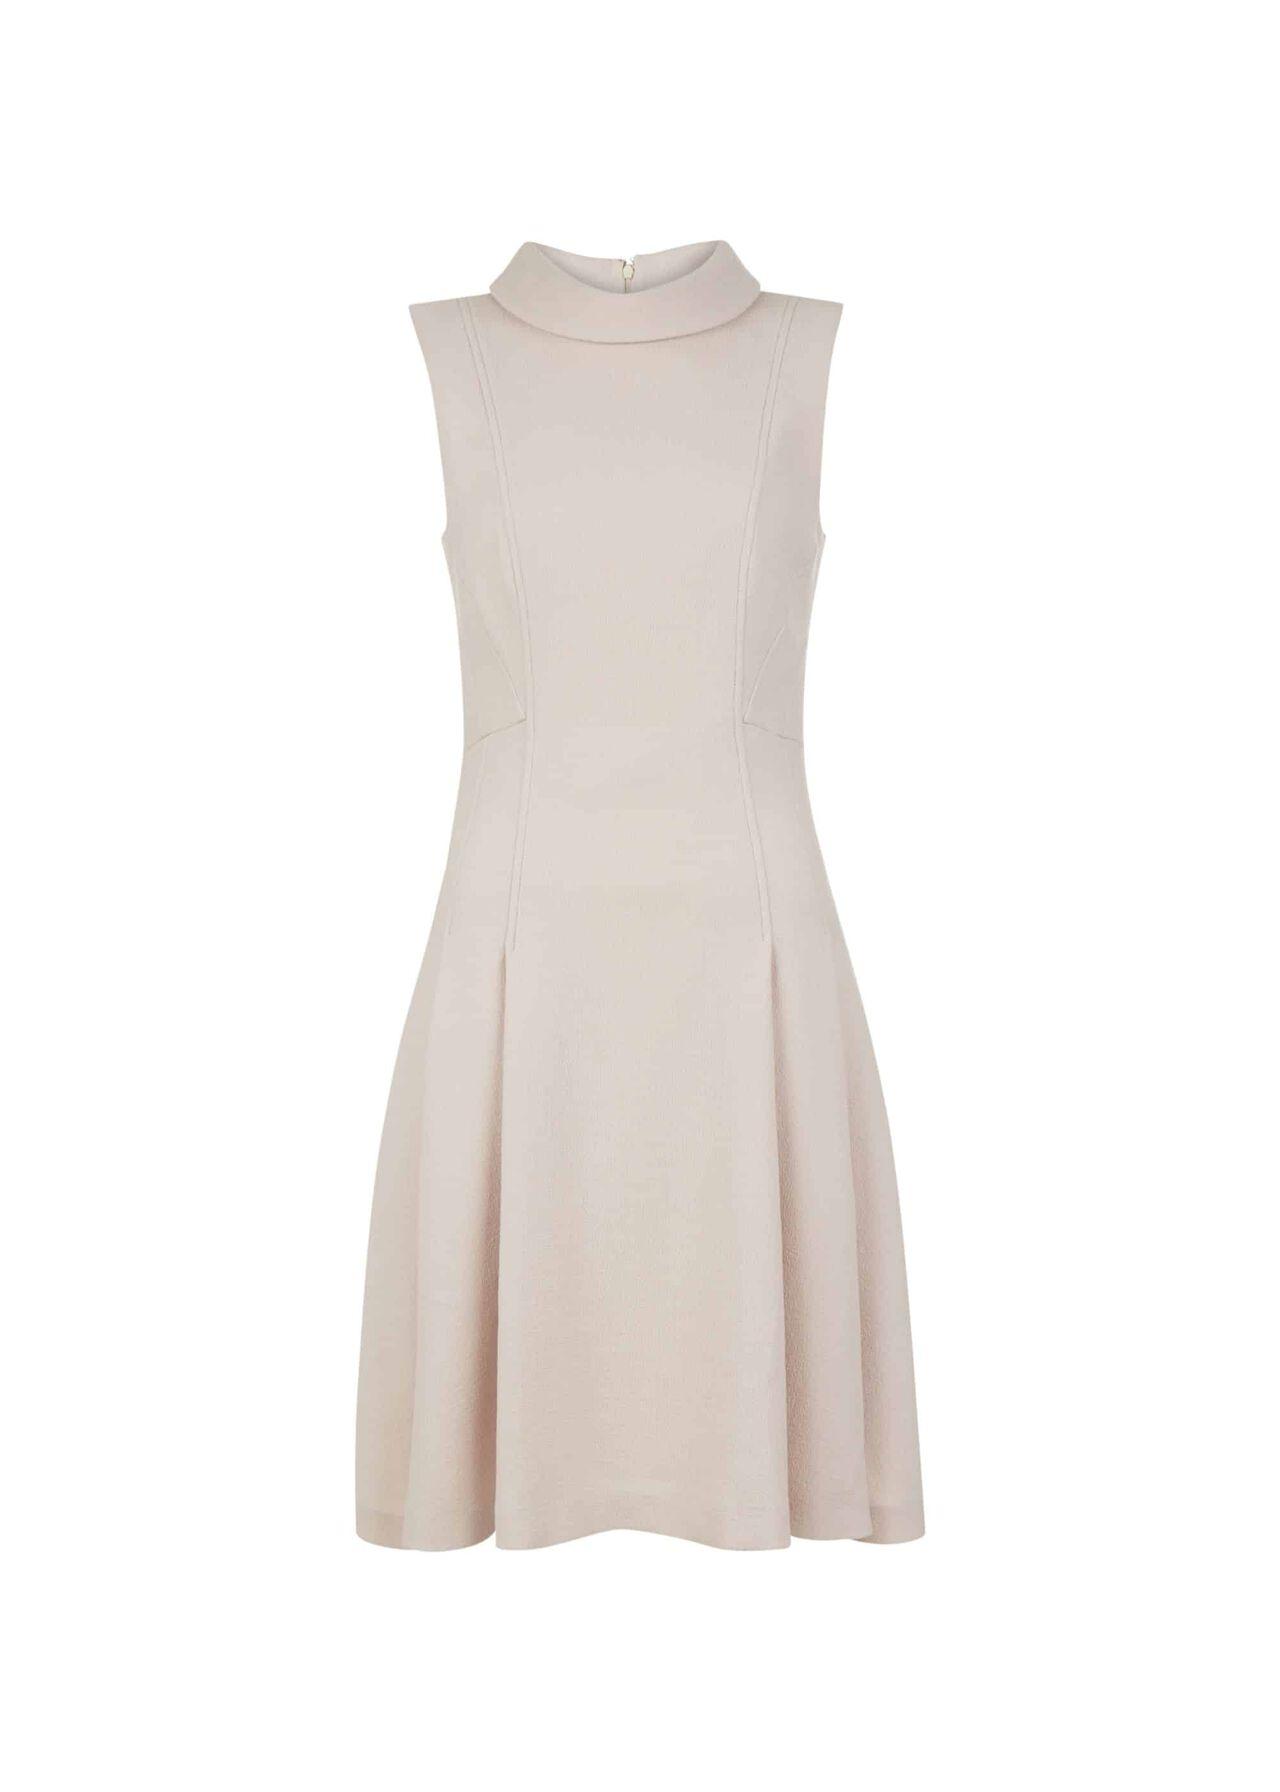 Wilhelmina Dress Pale Pink